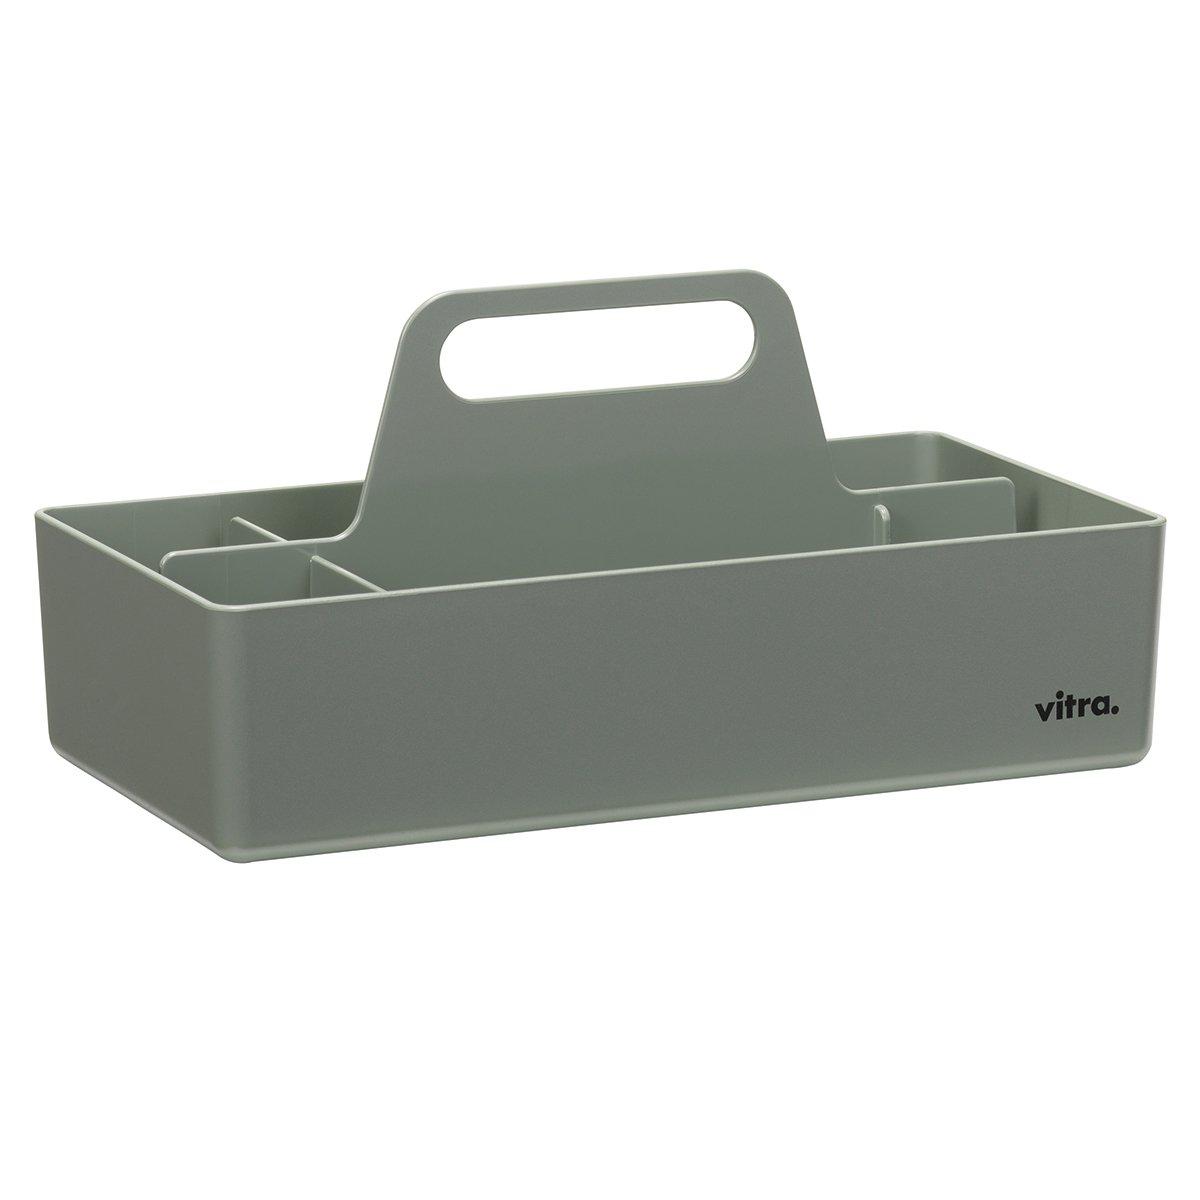 Vitra Storage Toolbox Opbergbak - Mosgrijs